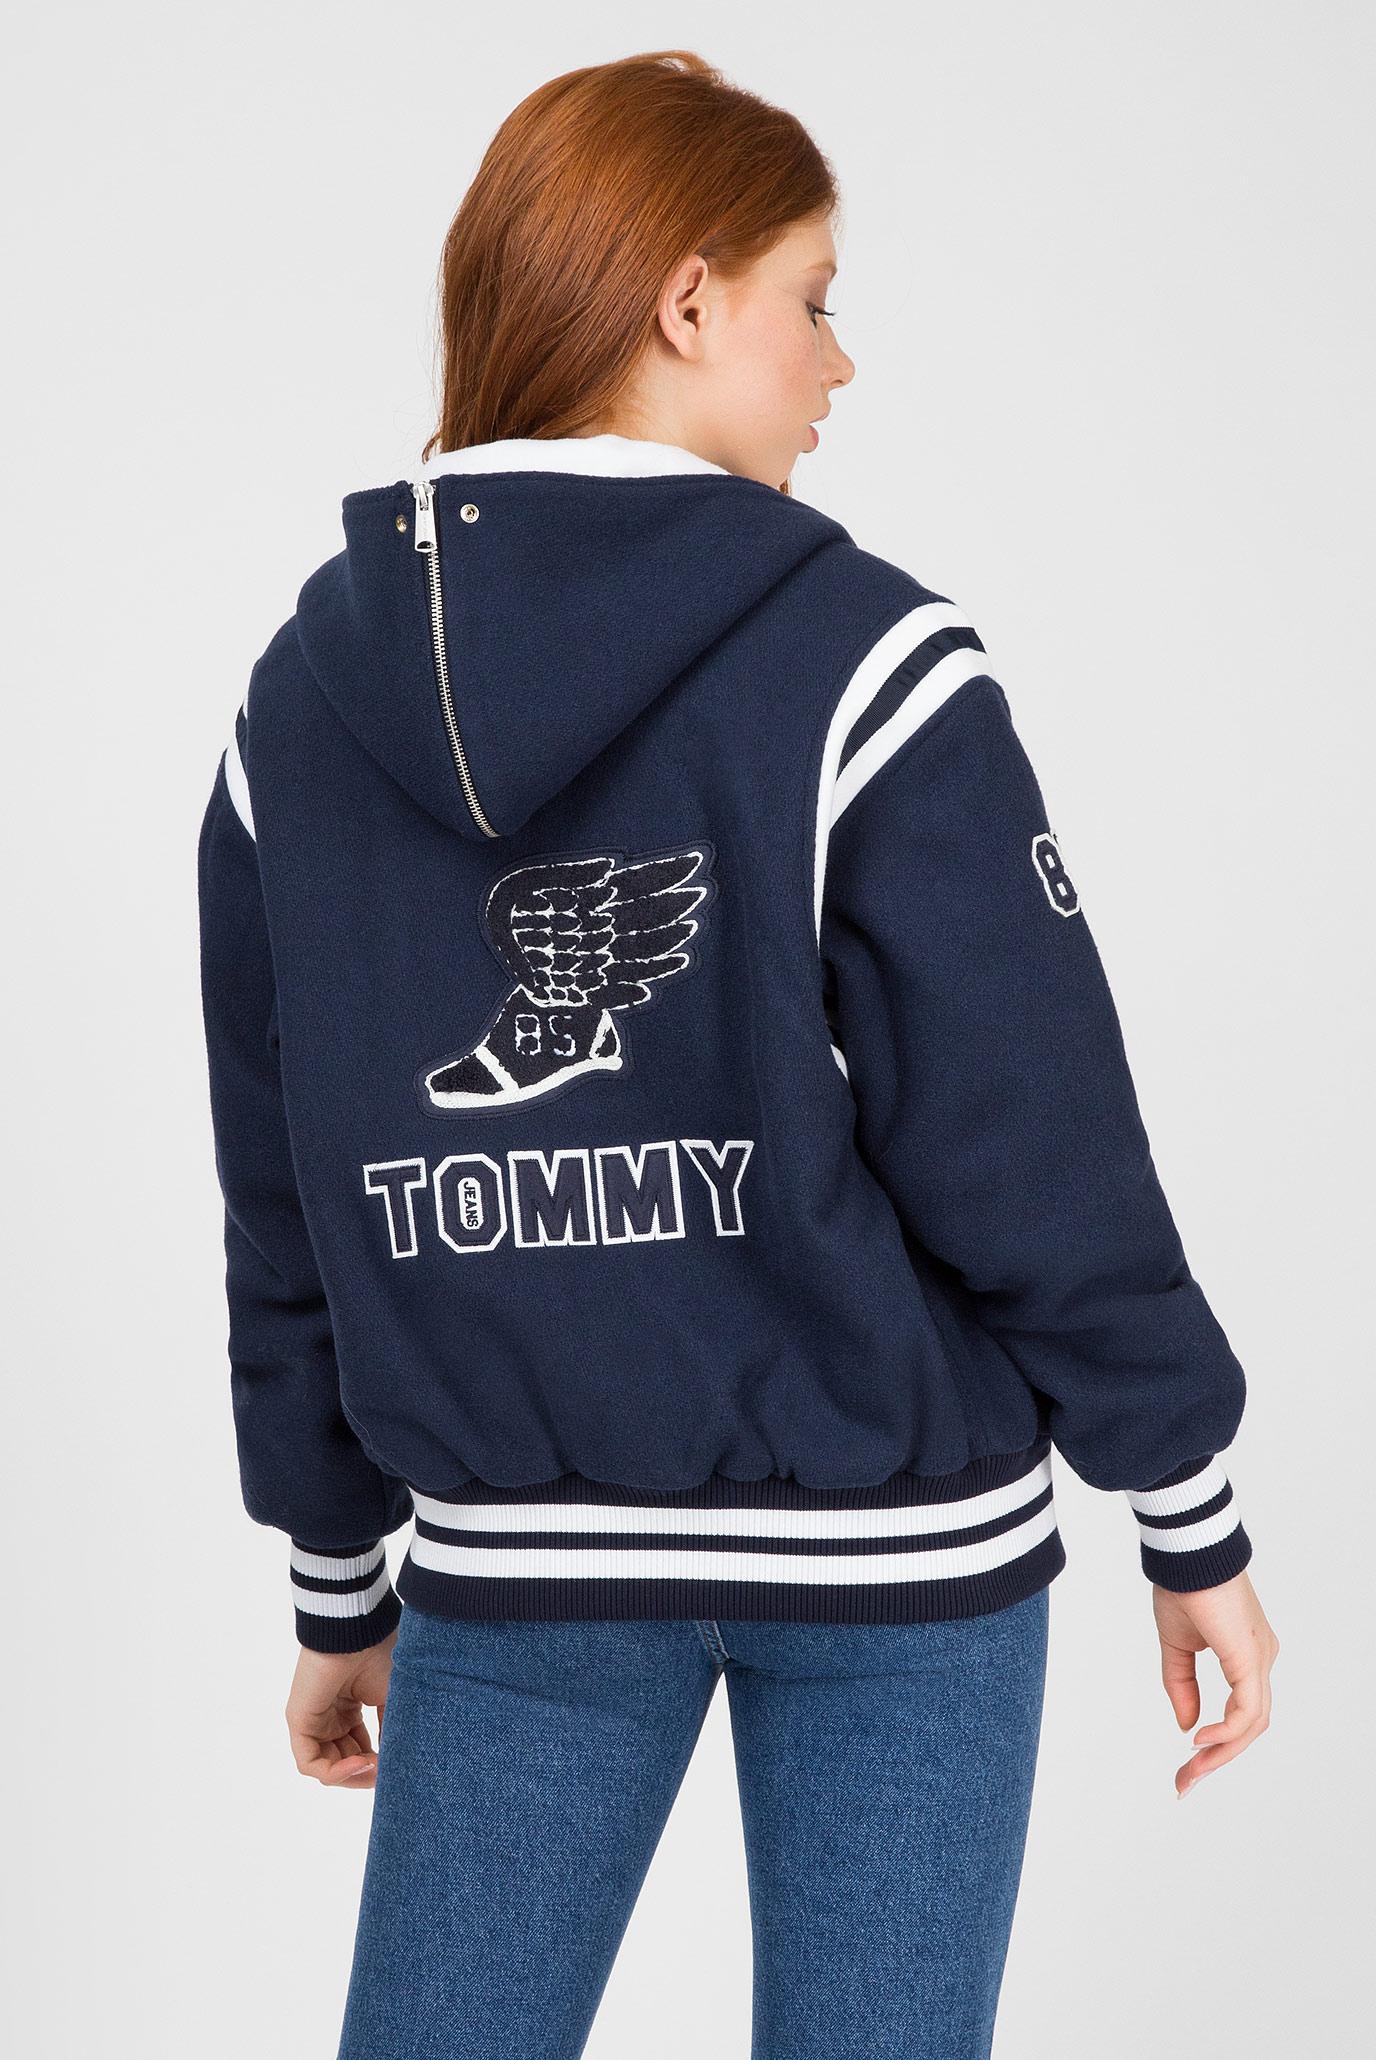 Купить Женский синий бомбер Tommy Hilfiger Tommy Hilfiger DW0DW05177 – Киев, Украина. Цены в интернет магазине MD Fashion